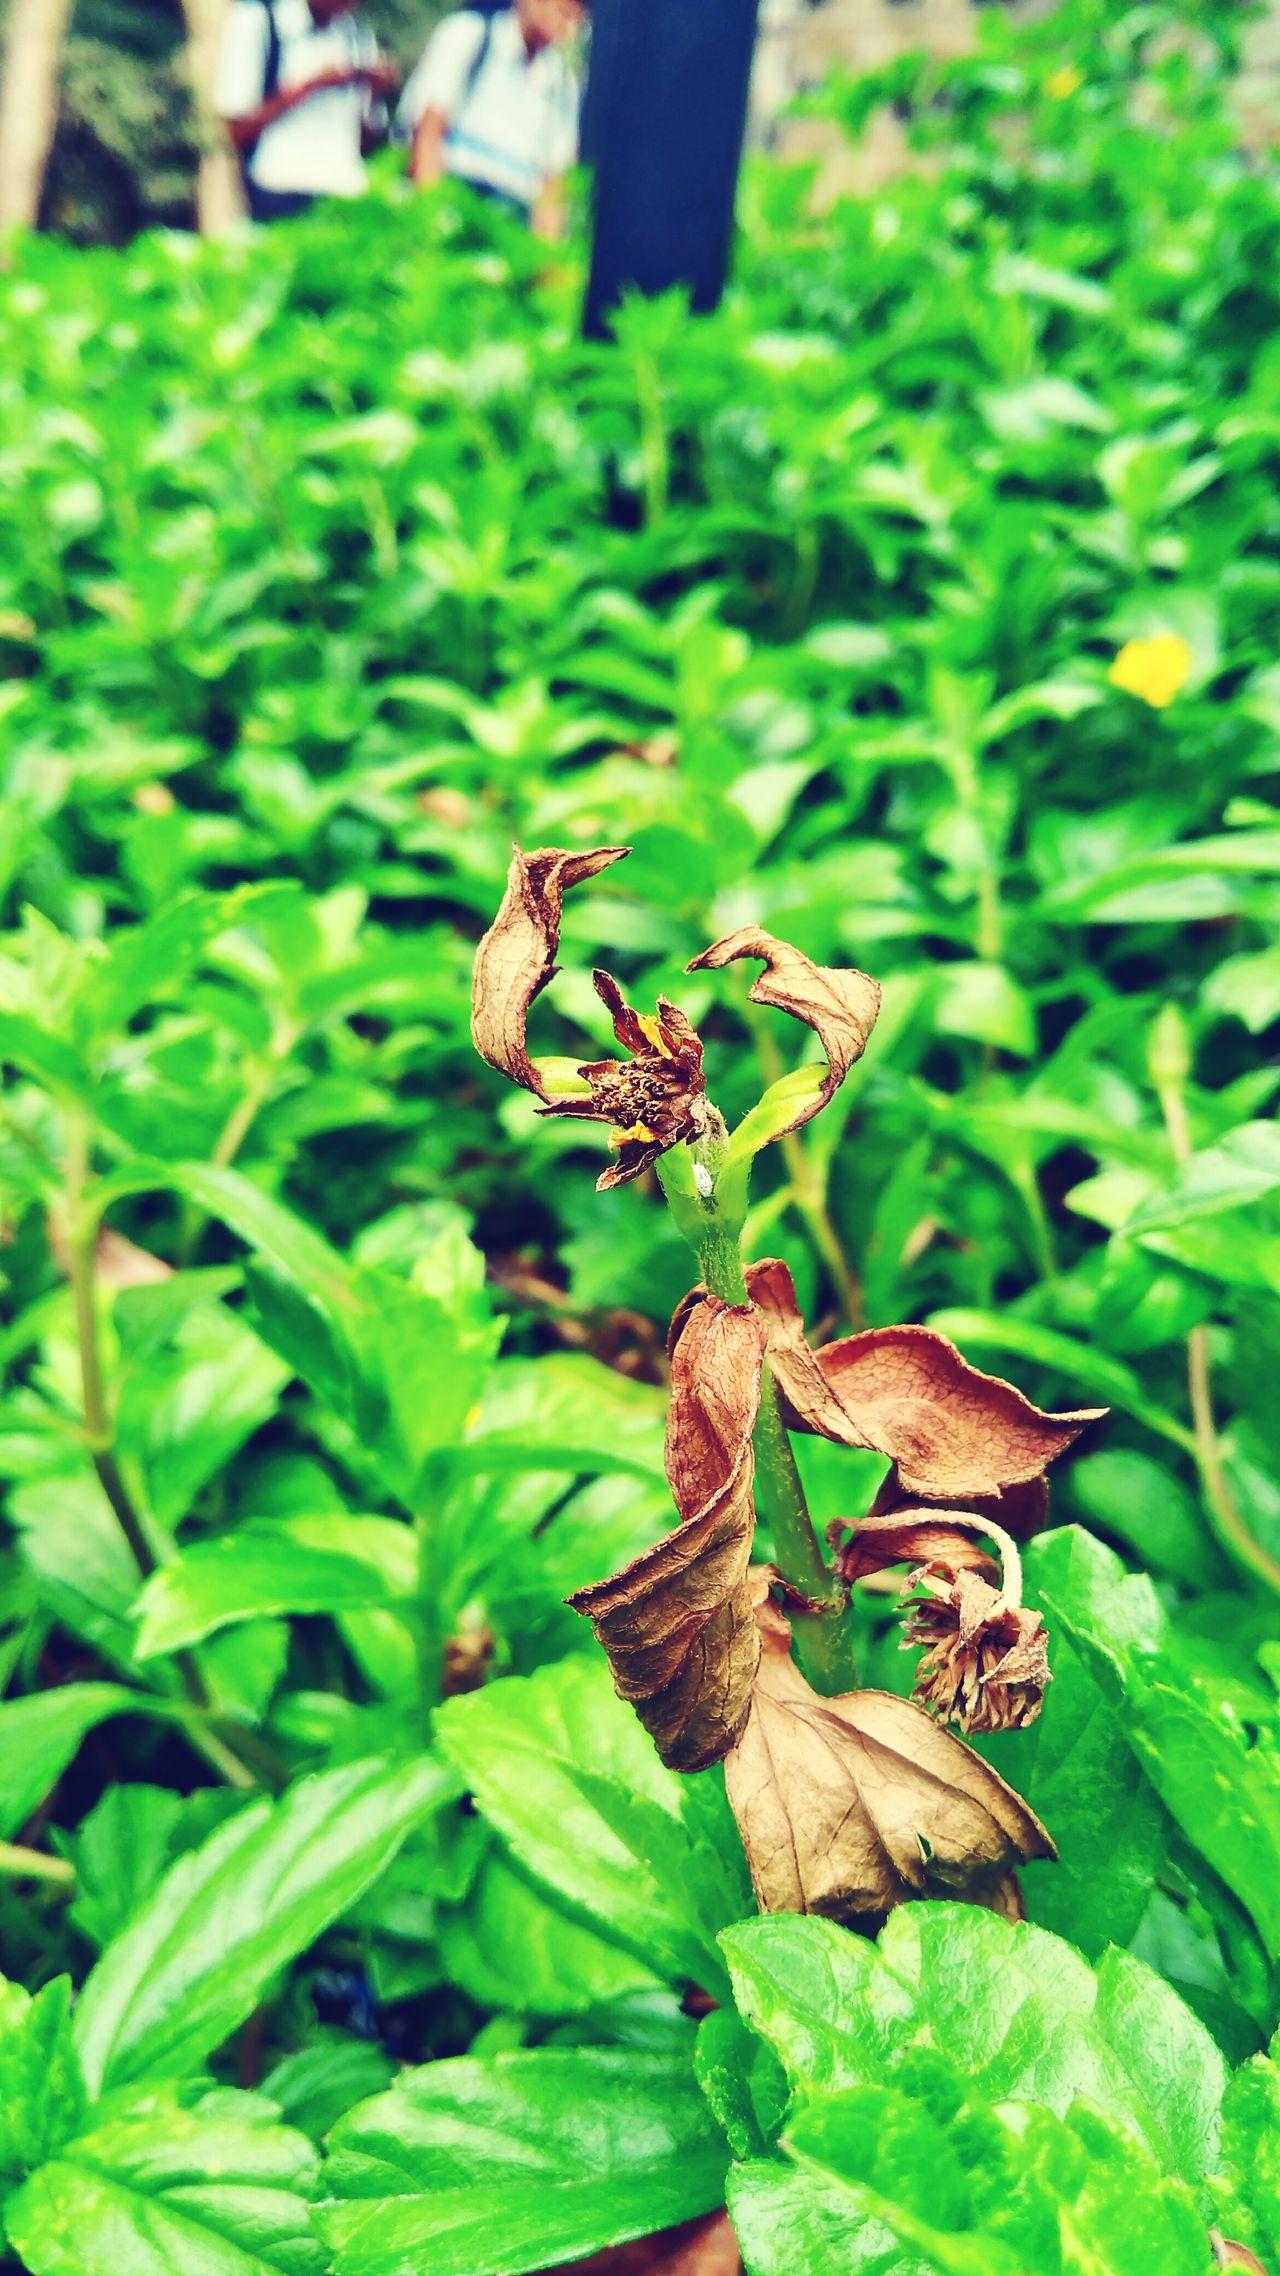 Garden Nature Plant Leaf Close-up Freshness